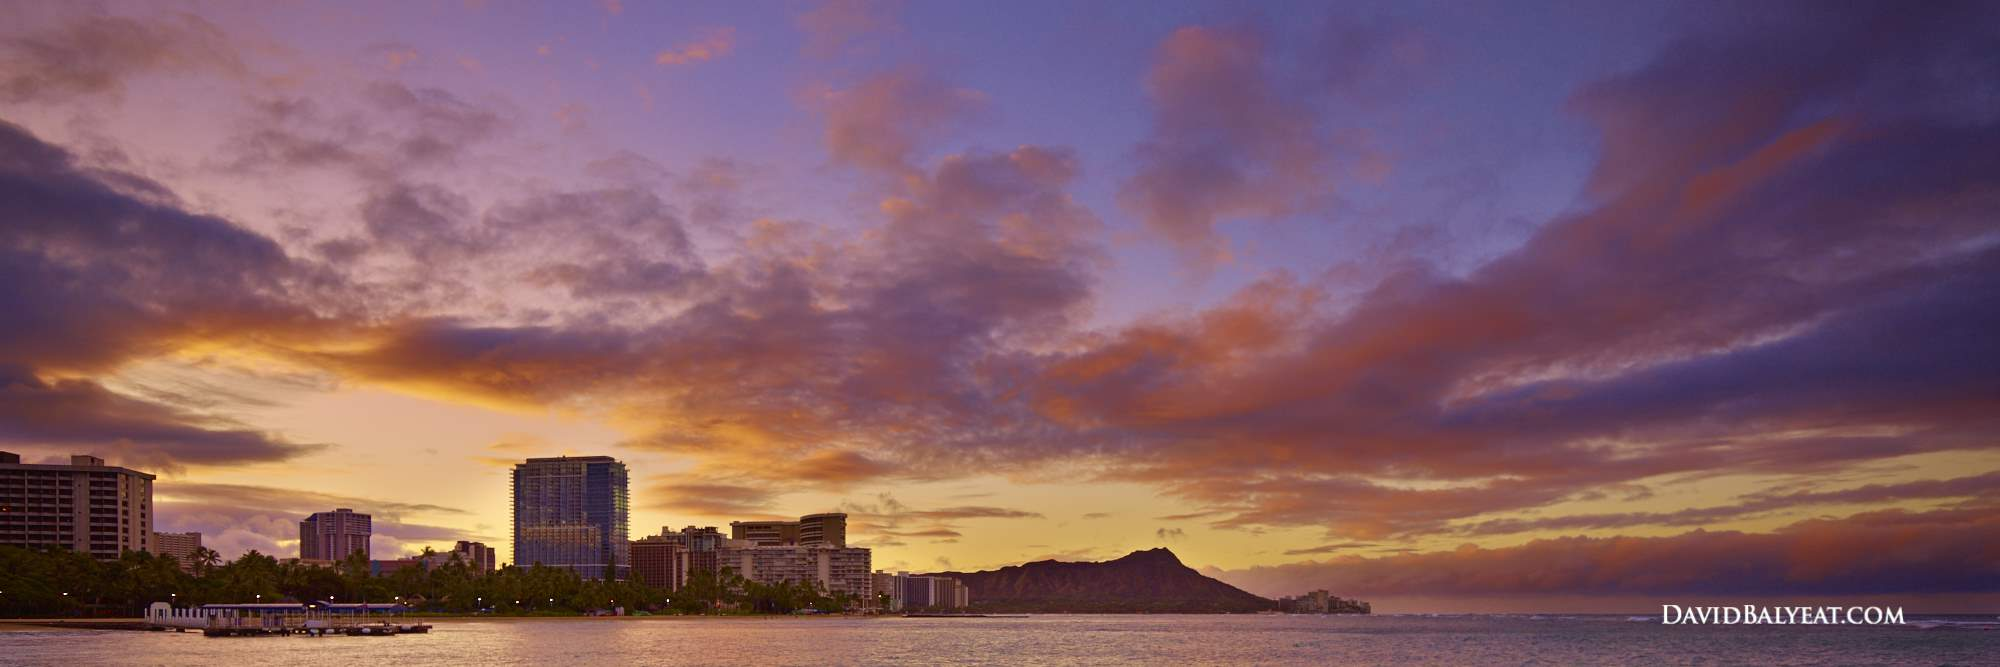 Waikiki Beach sunrise panoramic high-definition HD professional photography